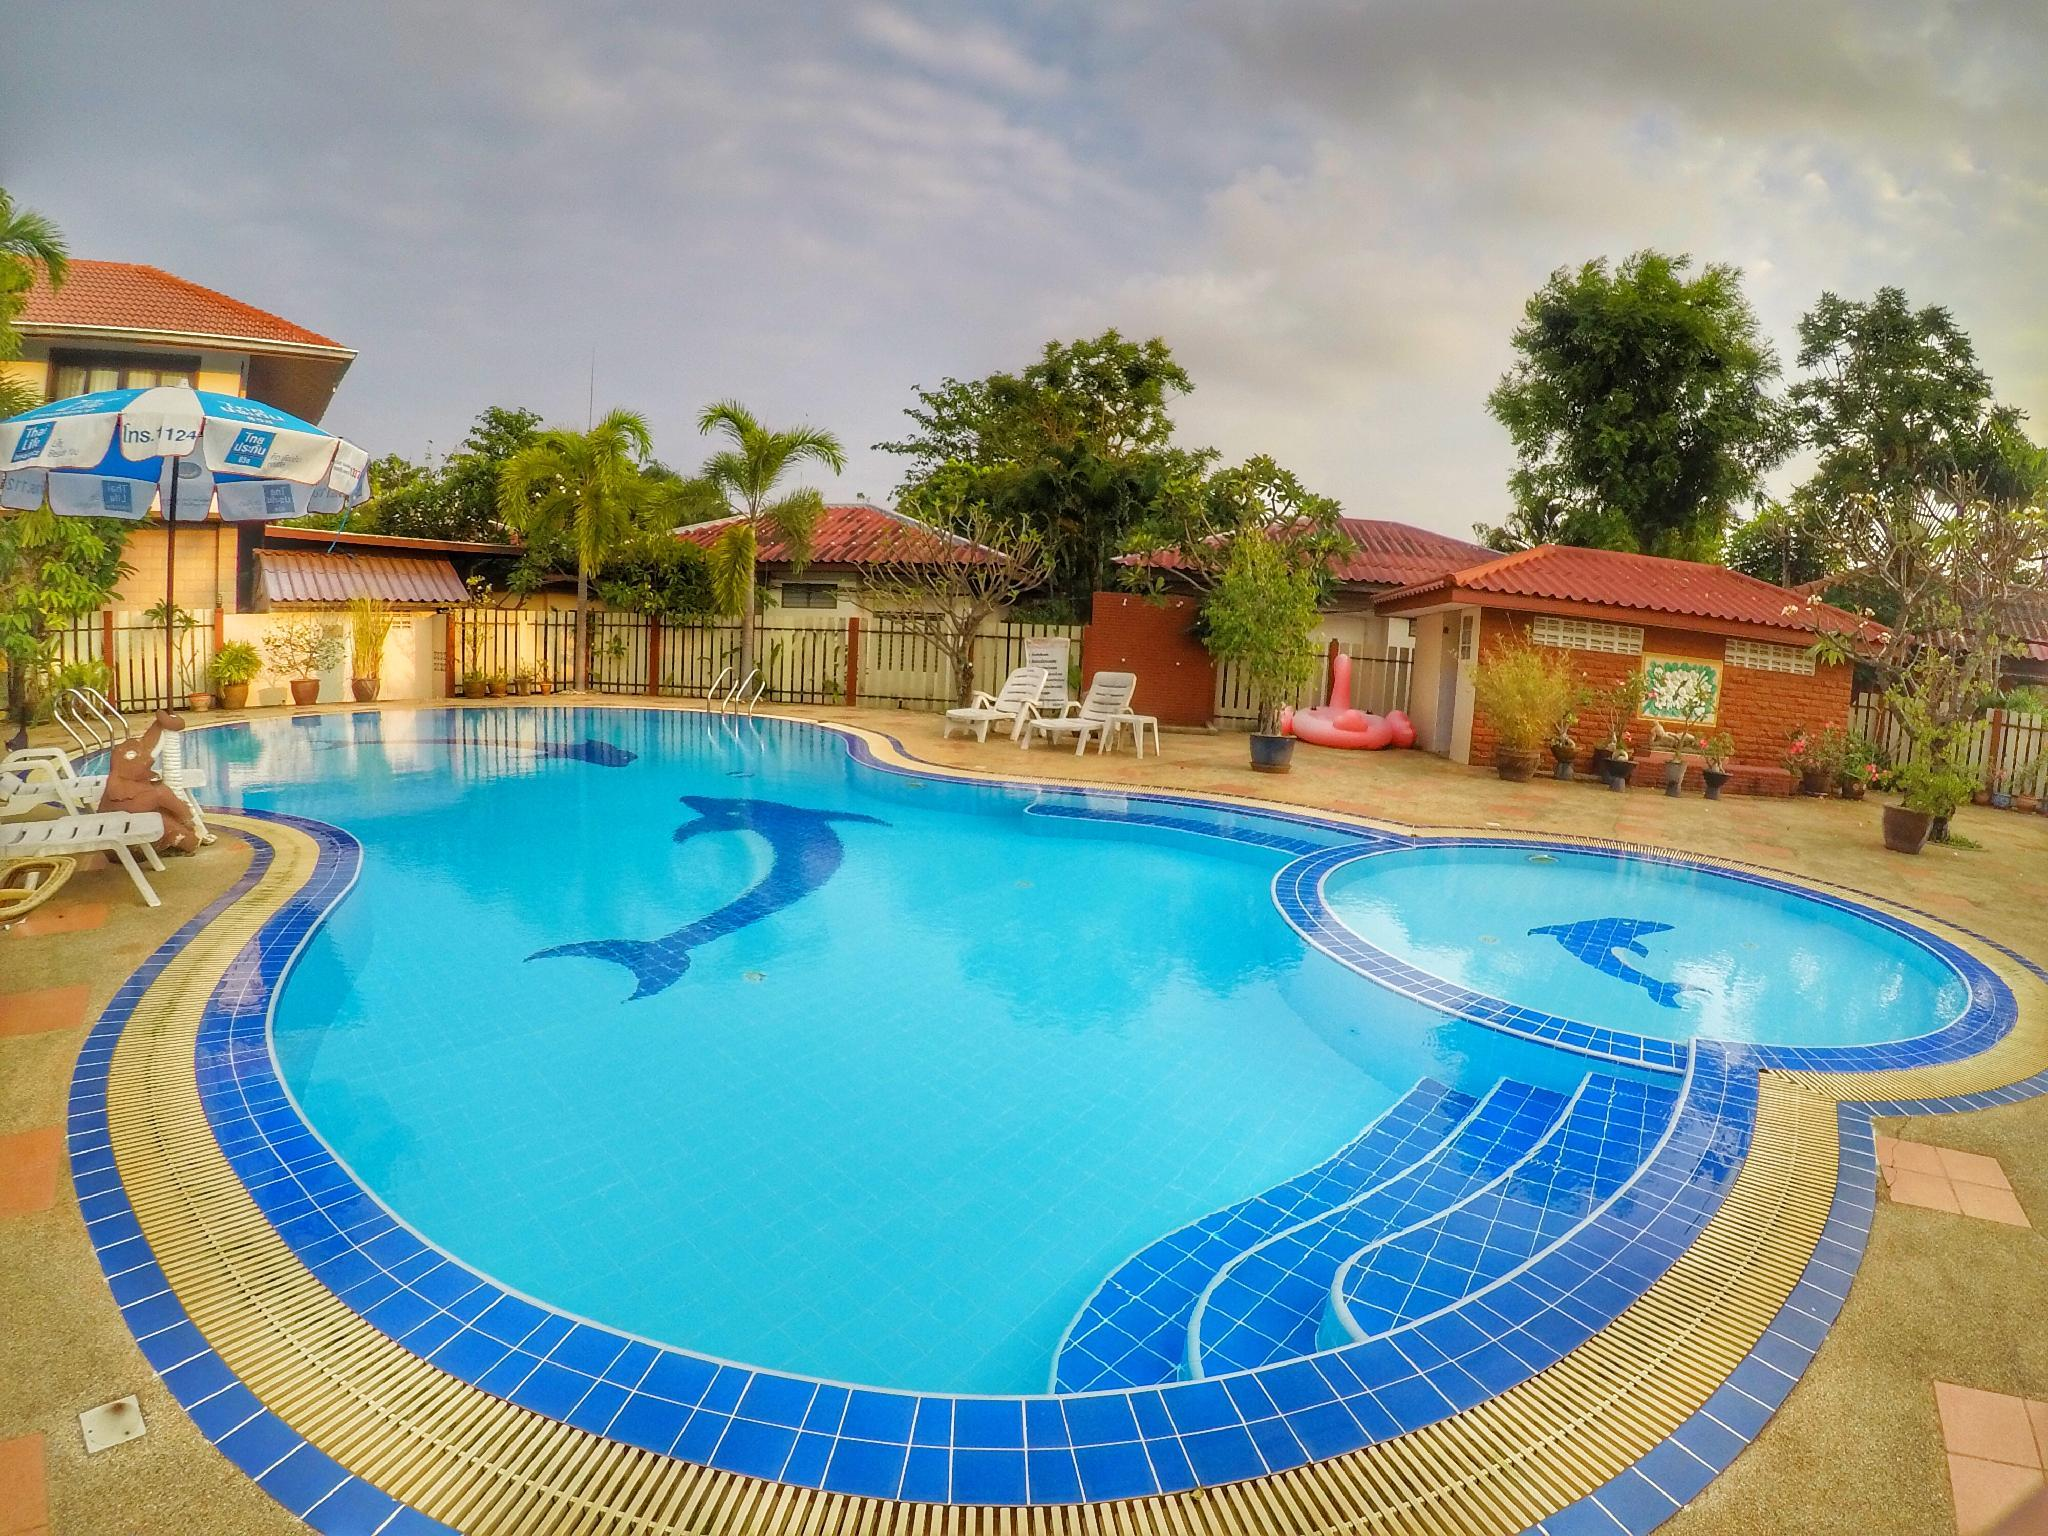 Busaba House Reviews